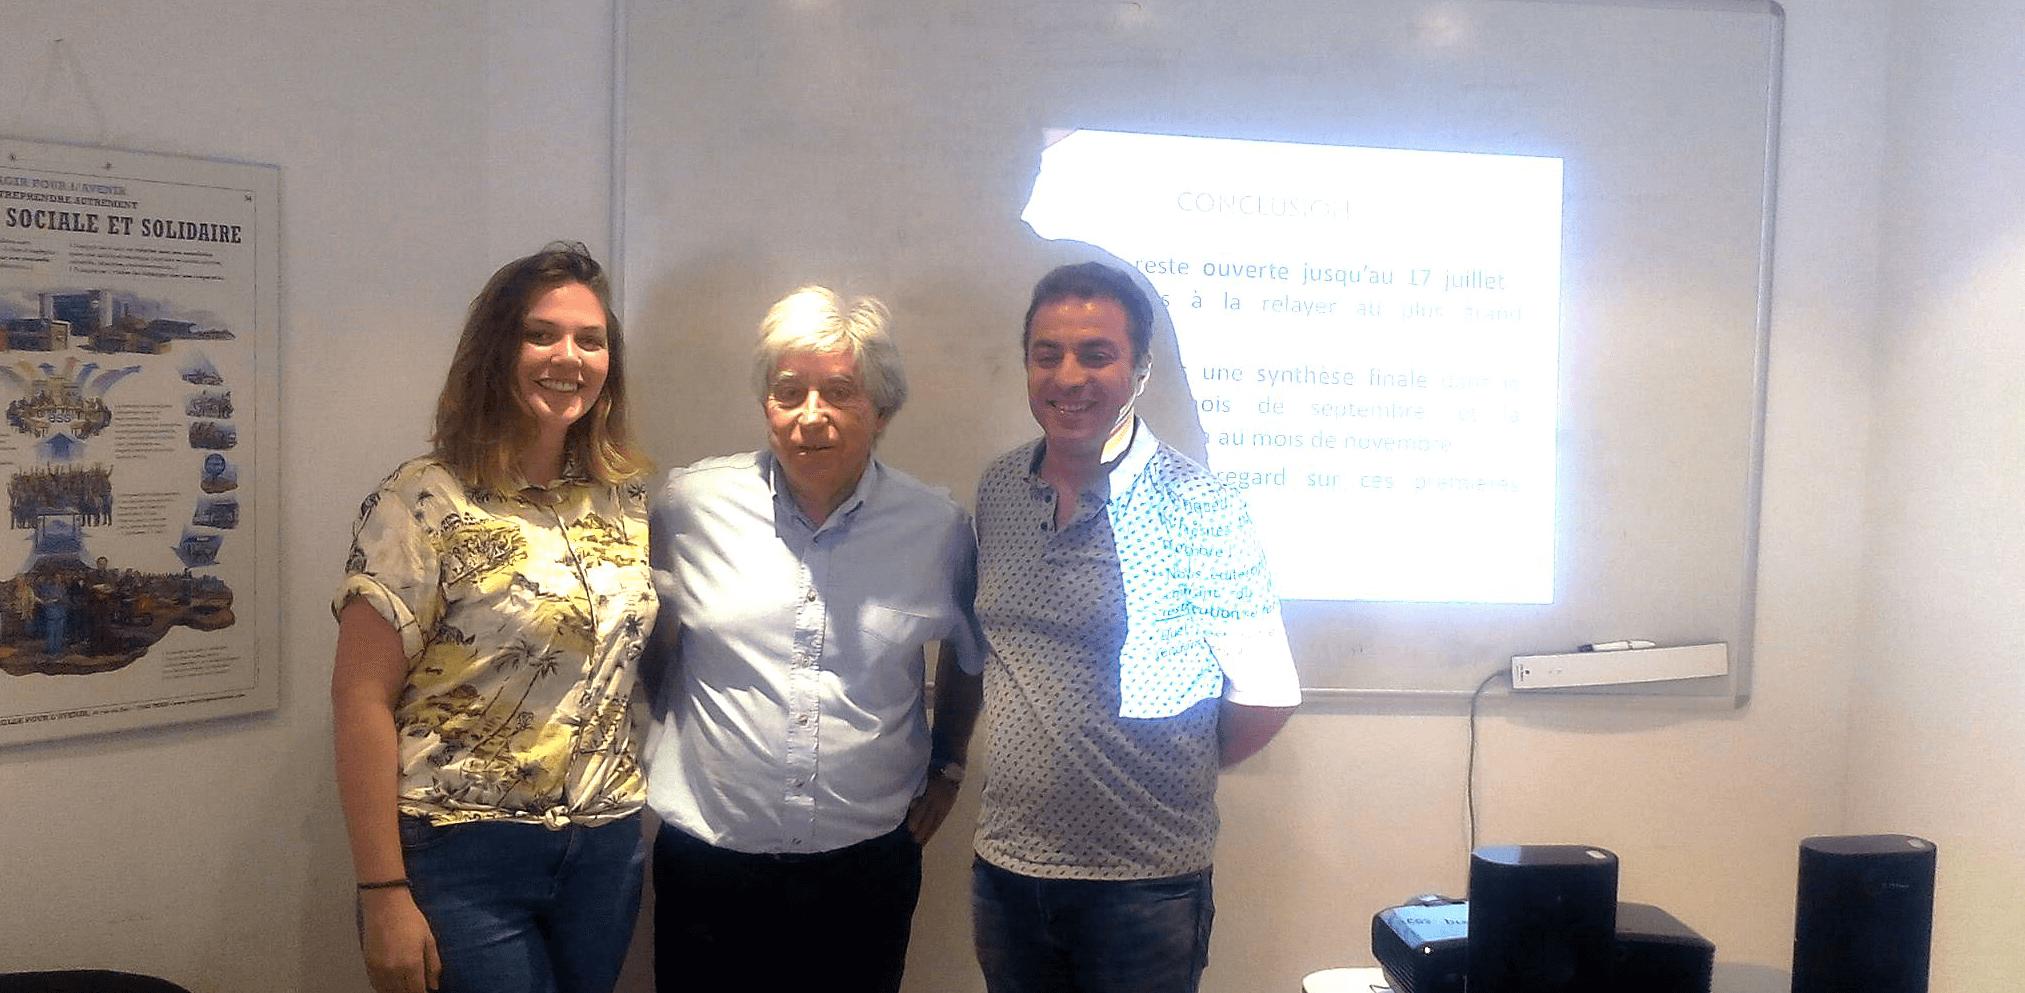 Clémentine Fournier, Jean-Claude Eyraud et Sam Khebizi